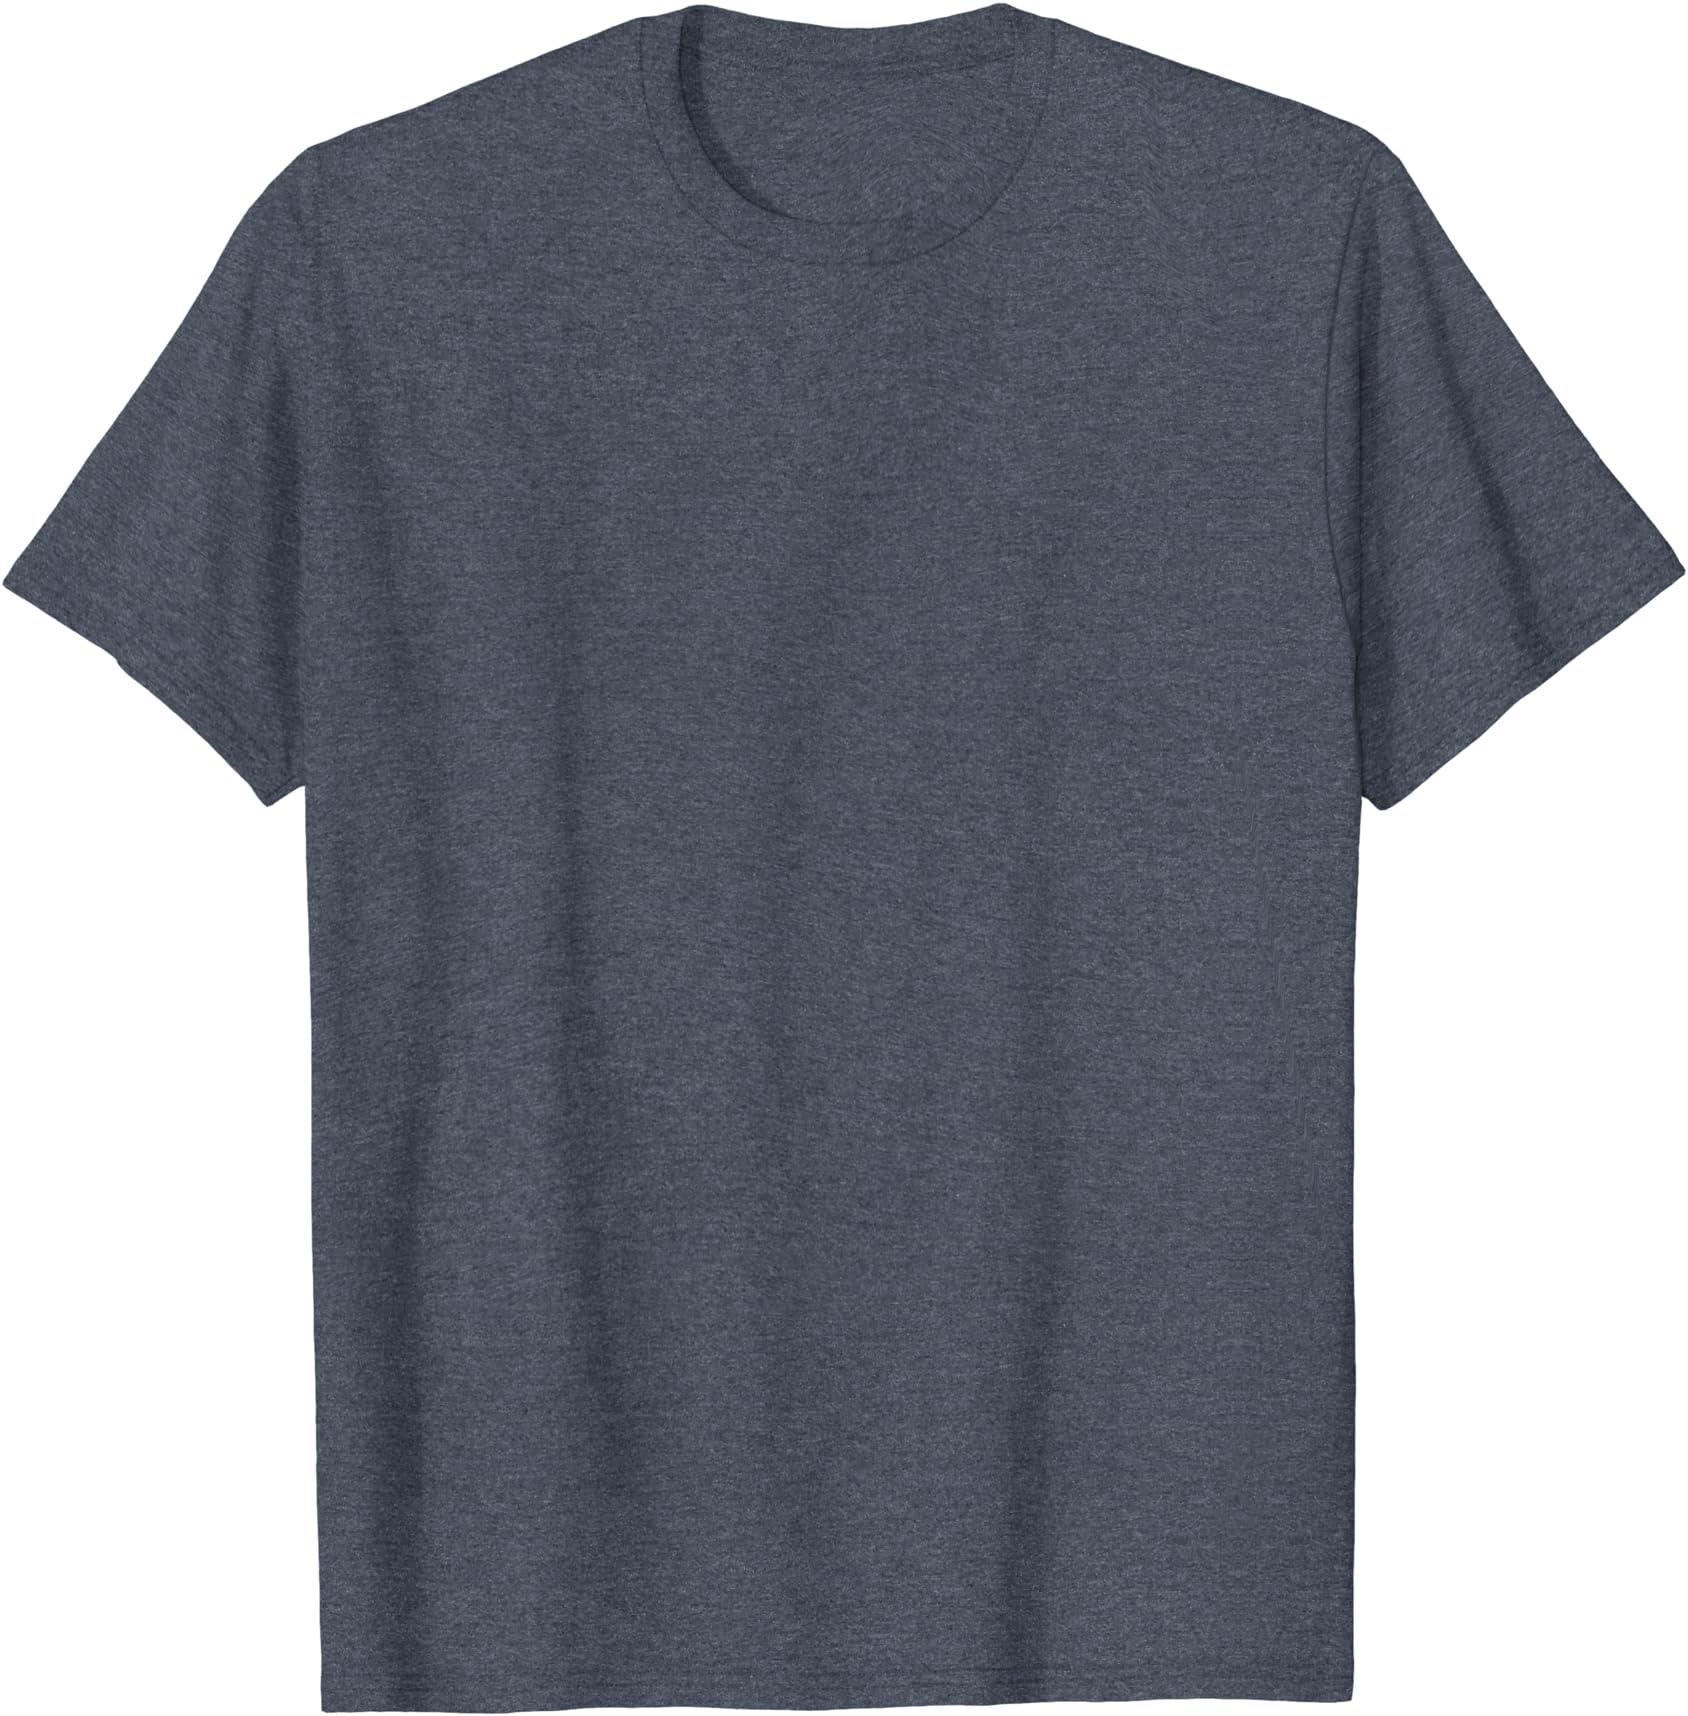 Two Seater Arrow White Logo T-Shirt Funny Joke Sarcastic Mens Sexual Gag Black